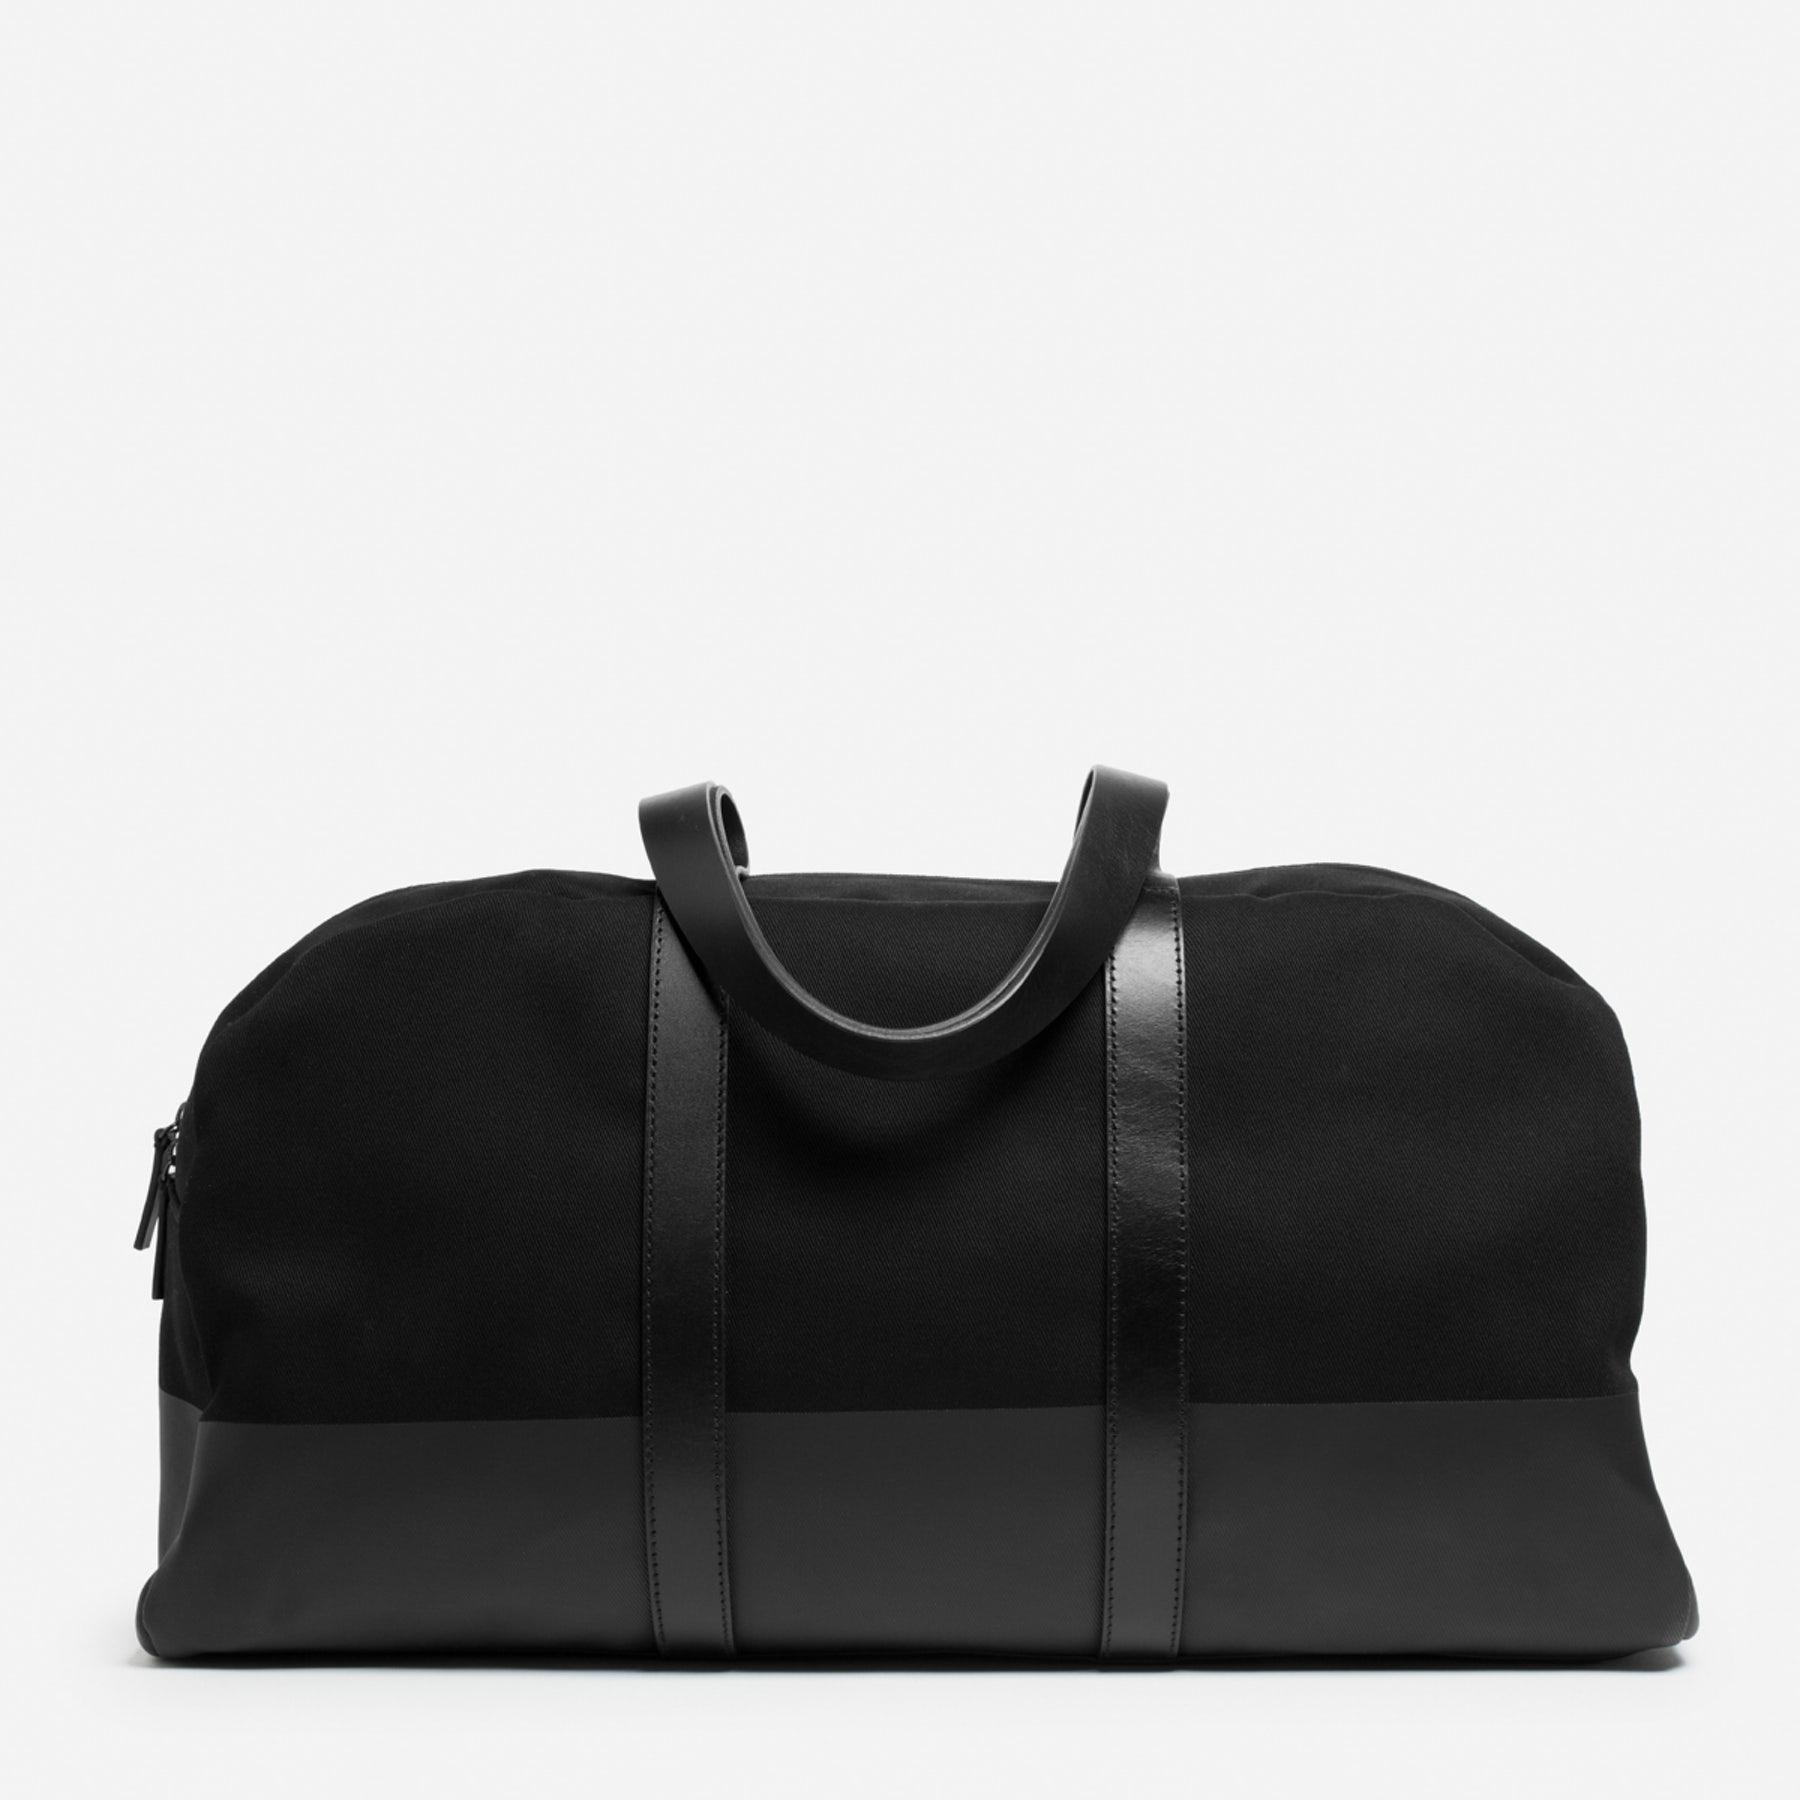 Goyard Duffle Bag